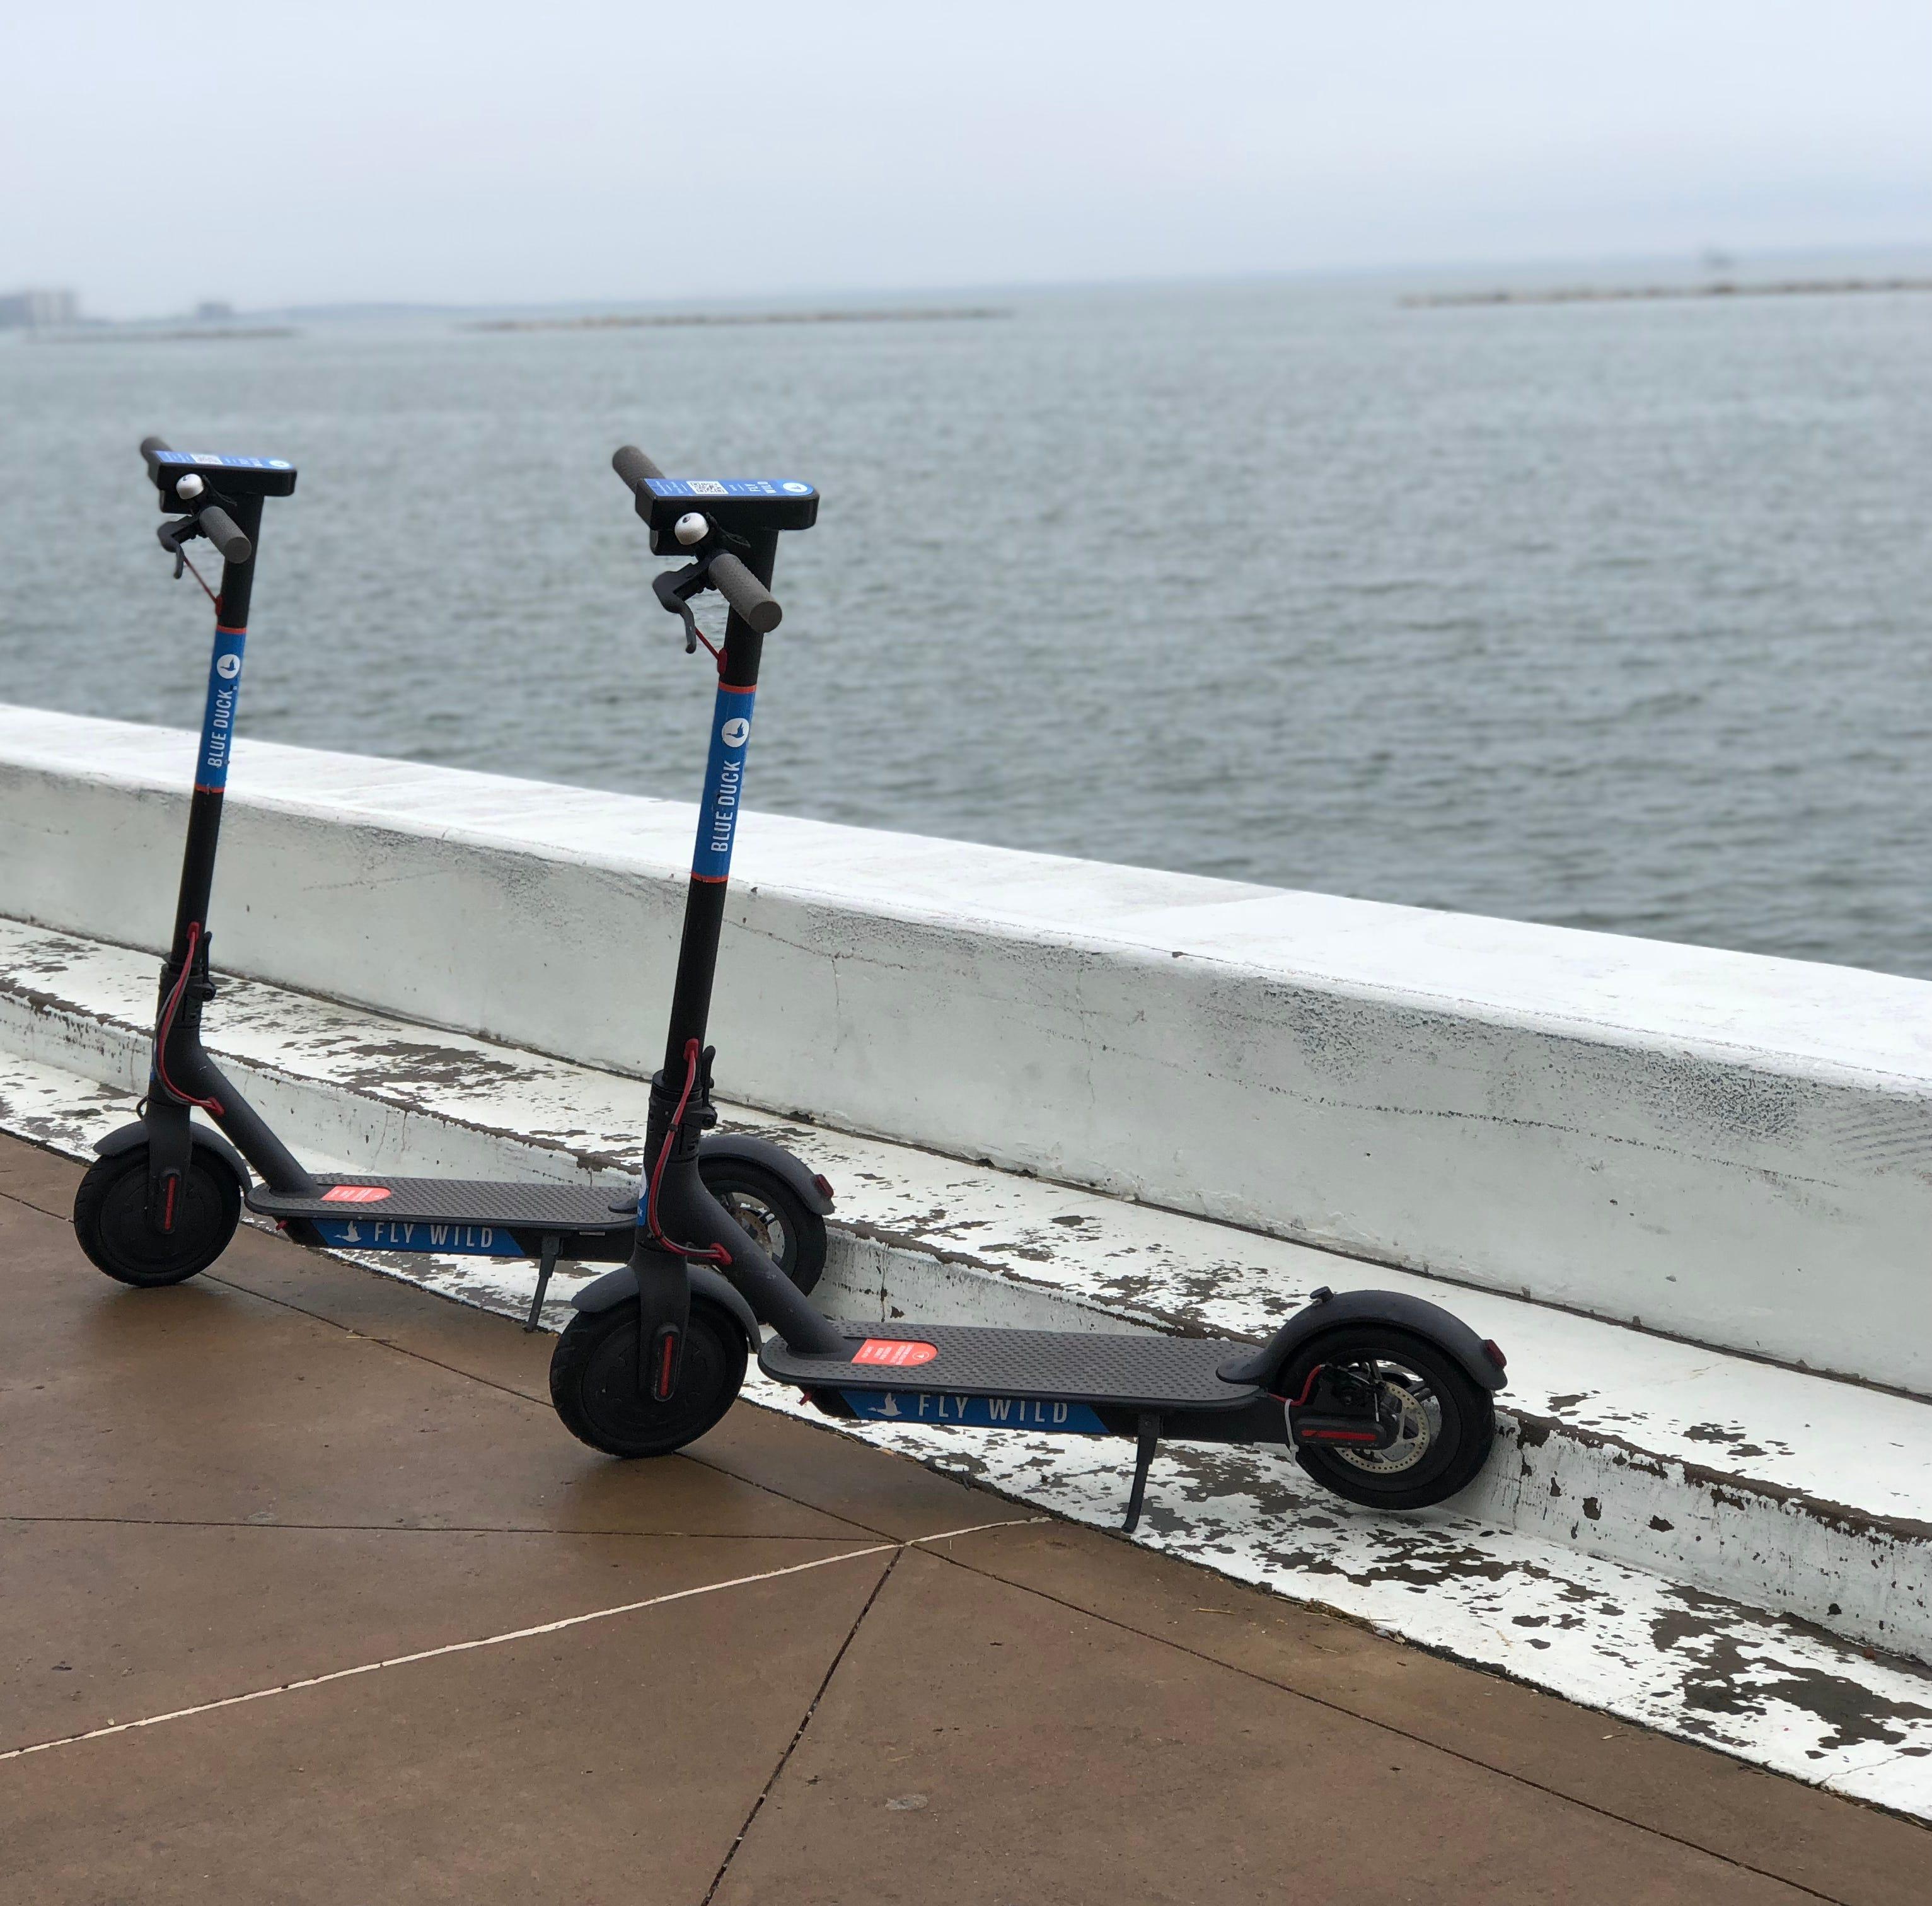 Here's a new way to travel around downtown Corpus Christi